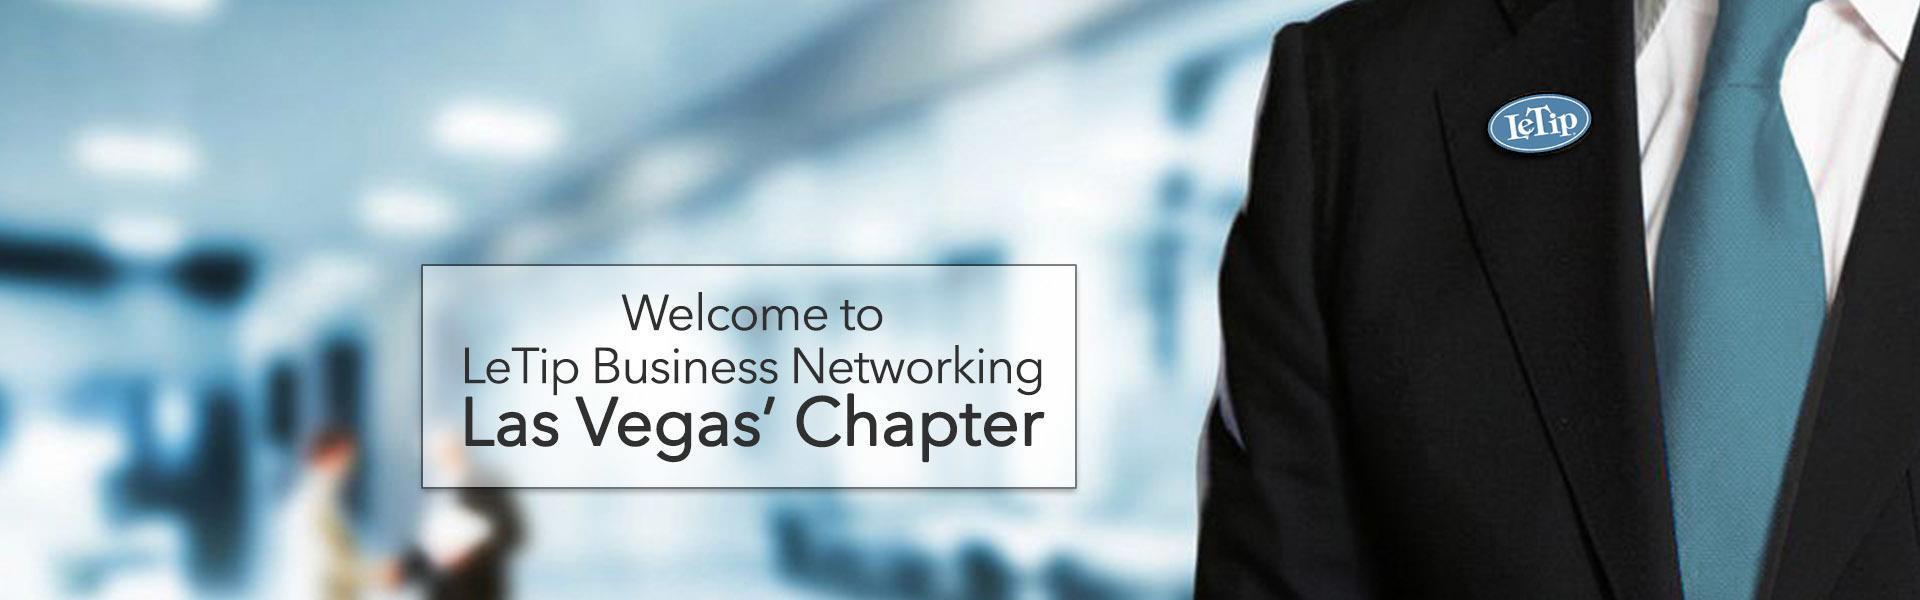 Letip Las Vegas Chapter